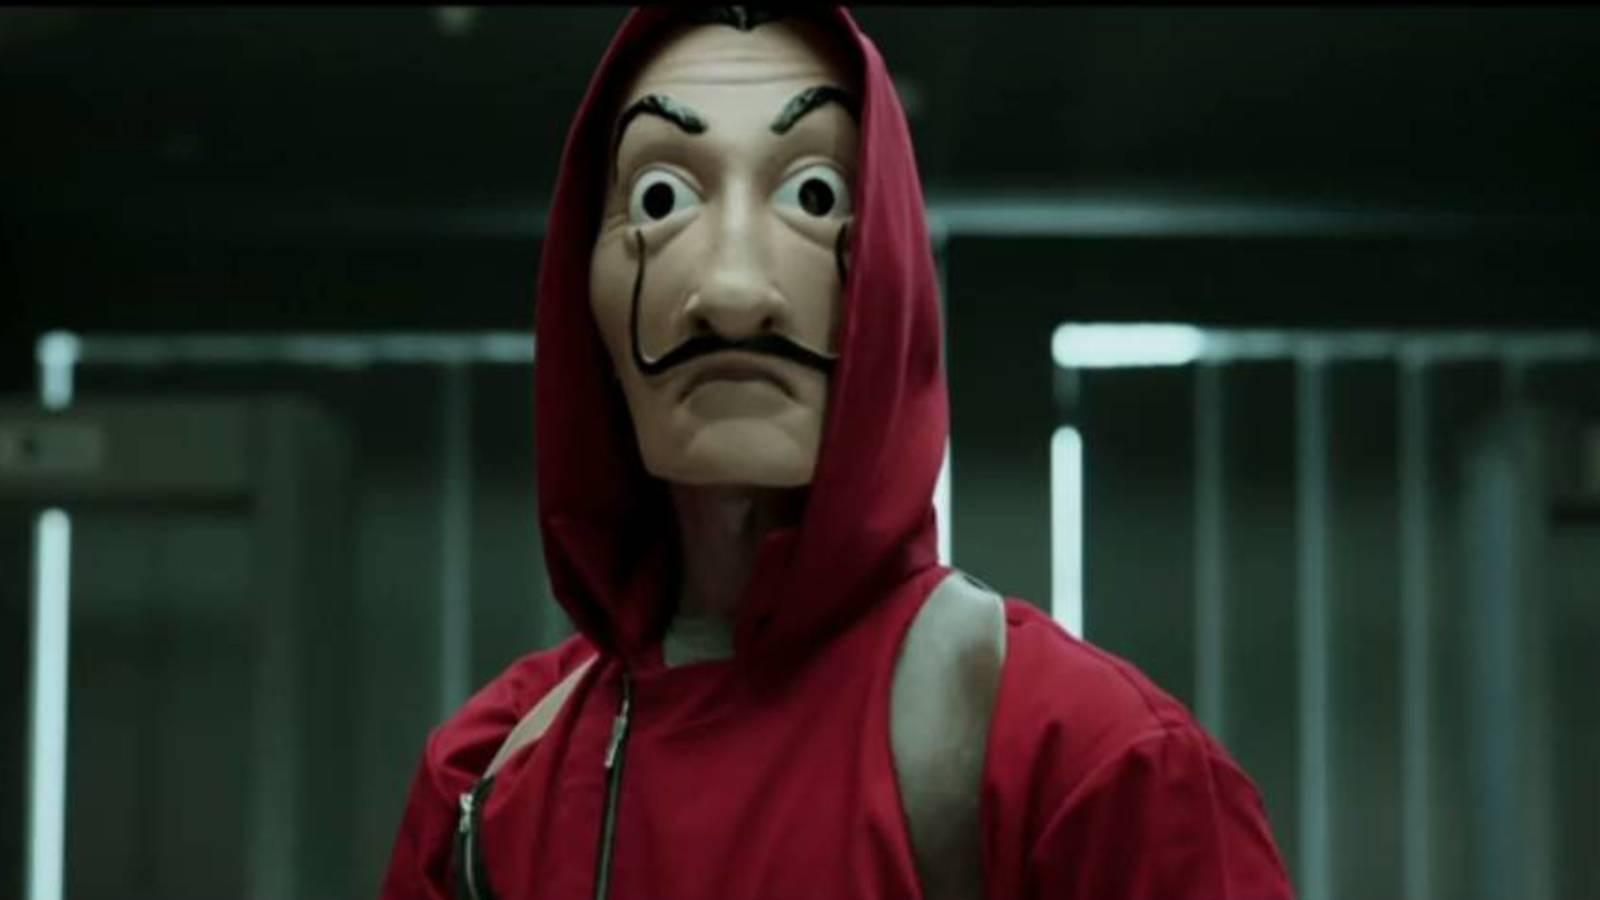 La Casa de Papel: Parte 3 | Trailer oficial | Netflix ...  |La Casa De Papel